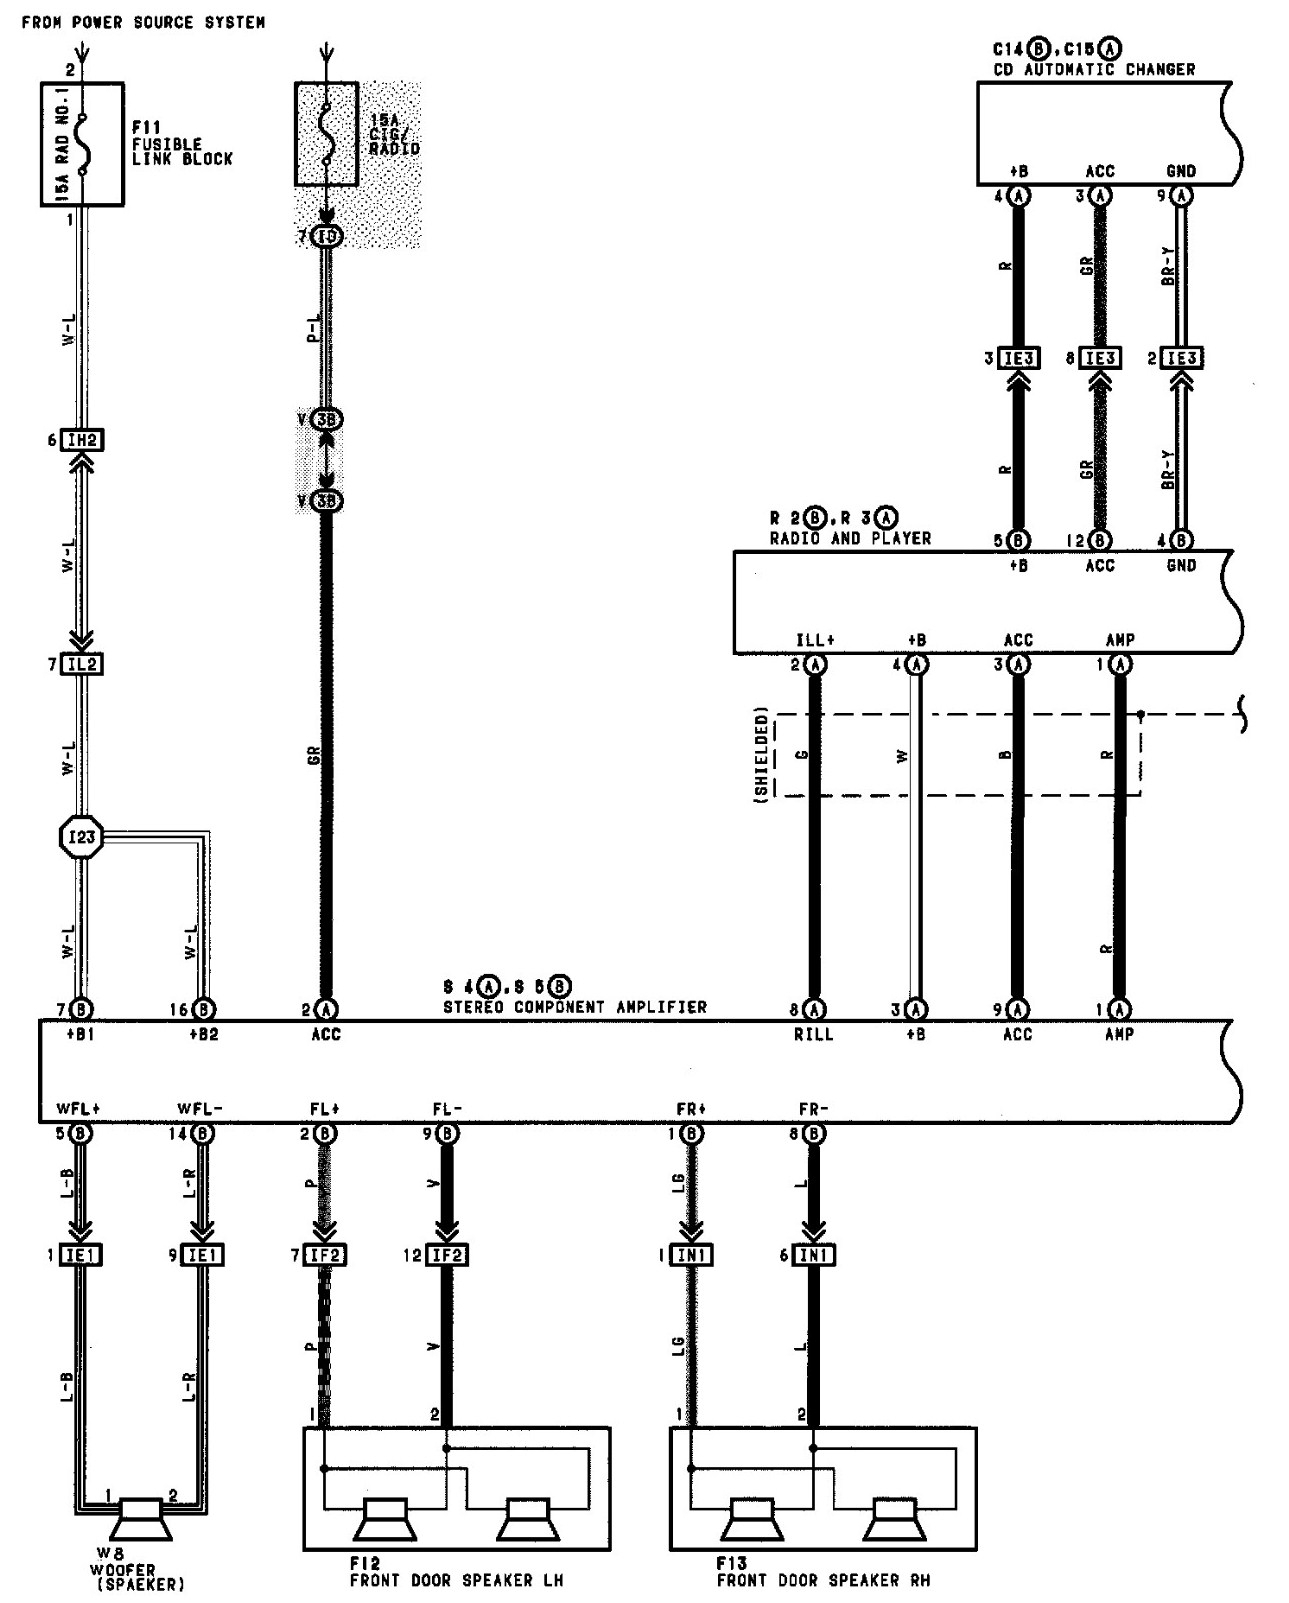 06 toyota rav4 belt diagram printable wiring diagram schematic